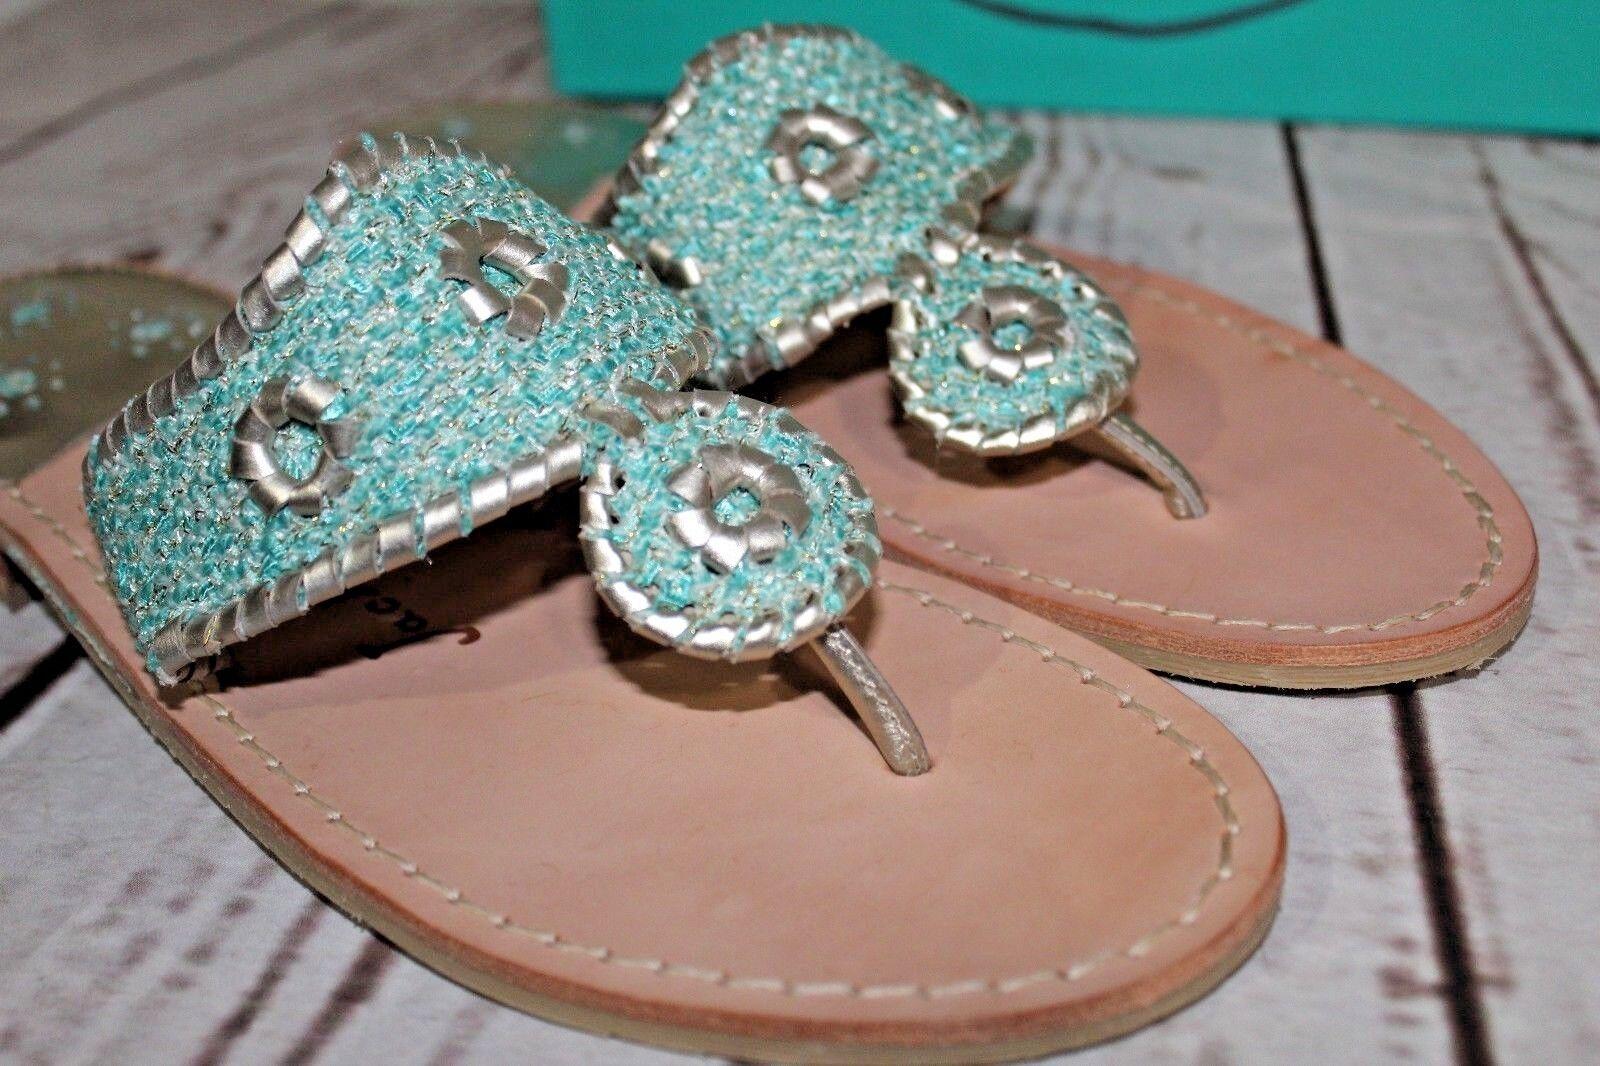 JACK ROGERS Genevieve Sandales thongs/Flip Flop Sz 10 M Blau Platinum Leder NEU